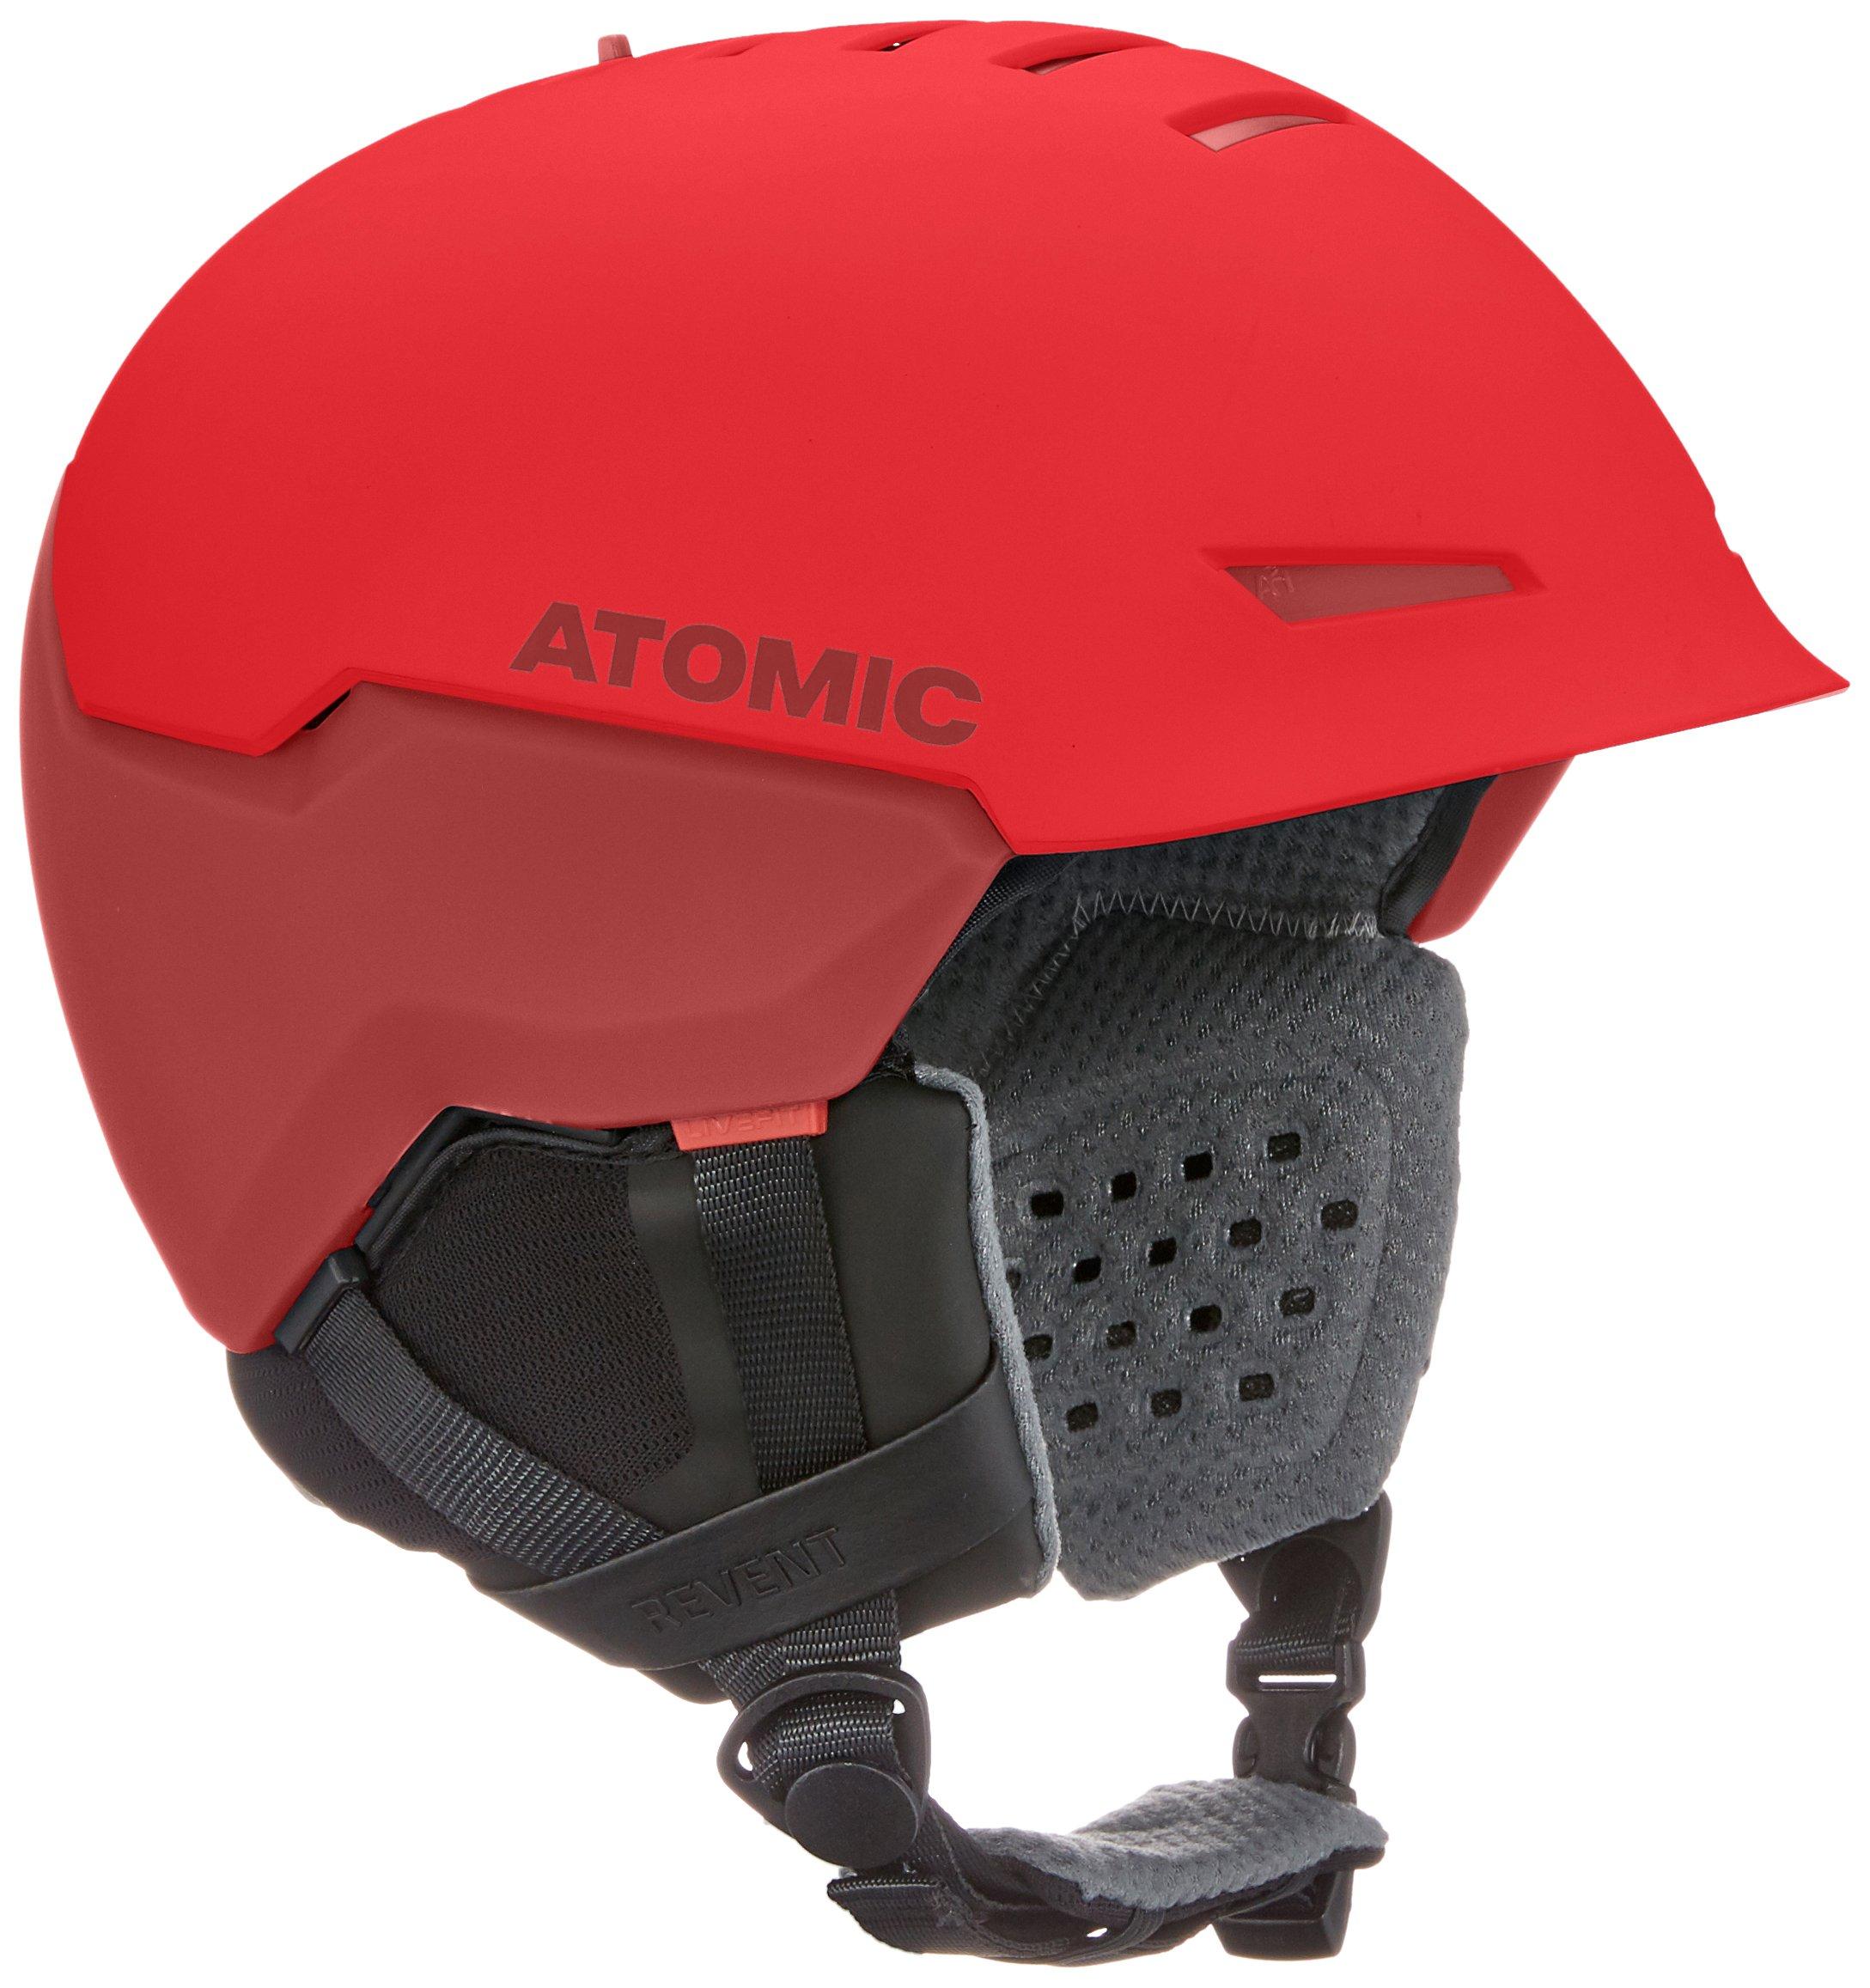 f9b3e4de529 Atomic Mountain Ski Helmet